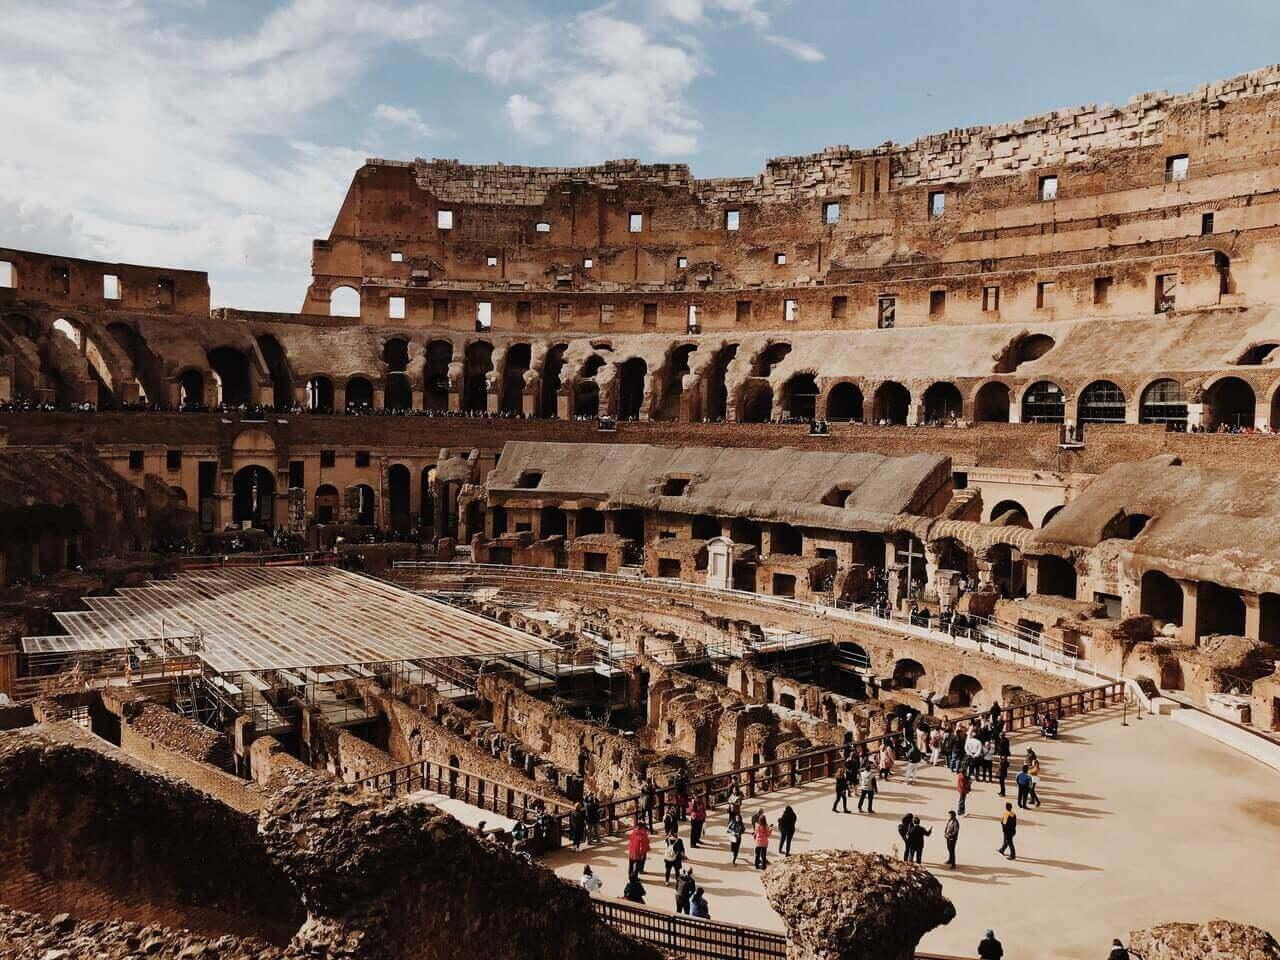 Facts of Roman Colosseum